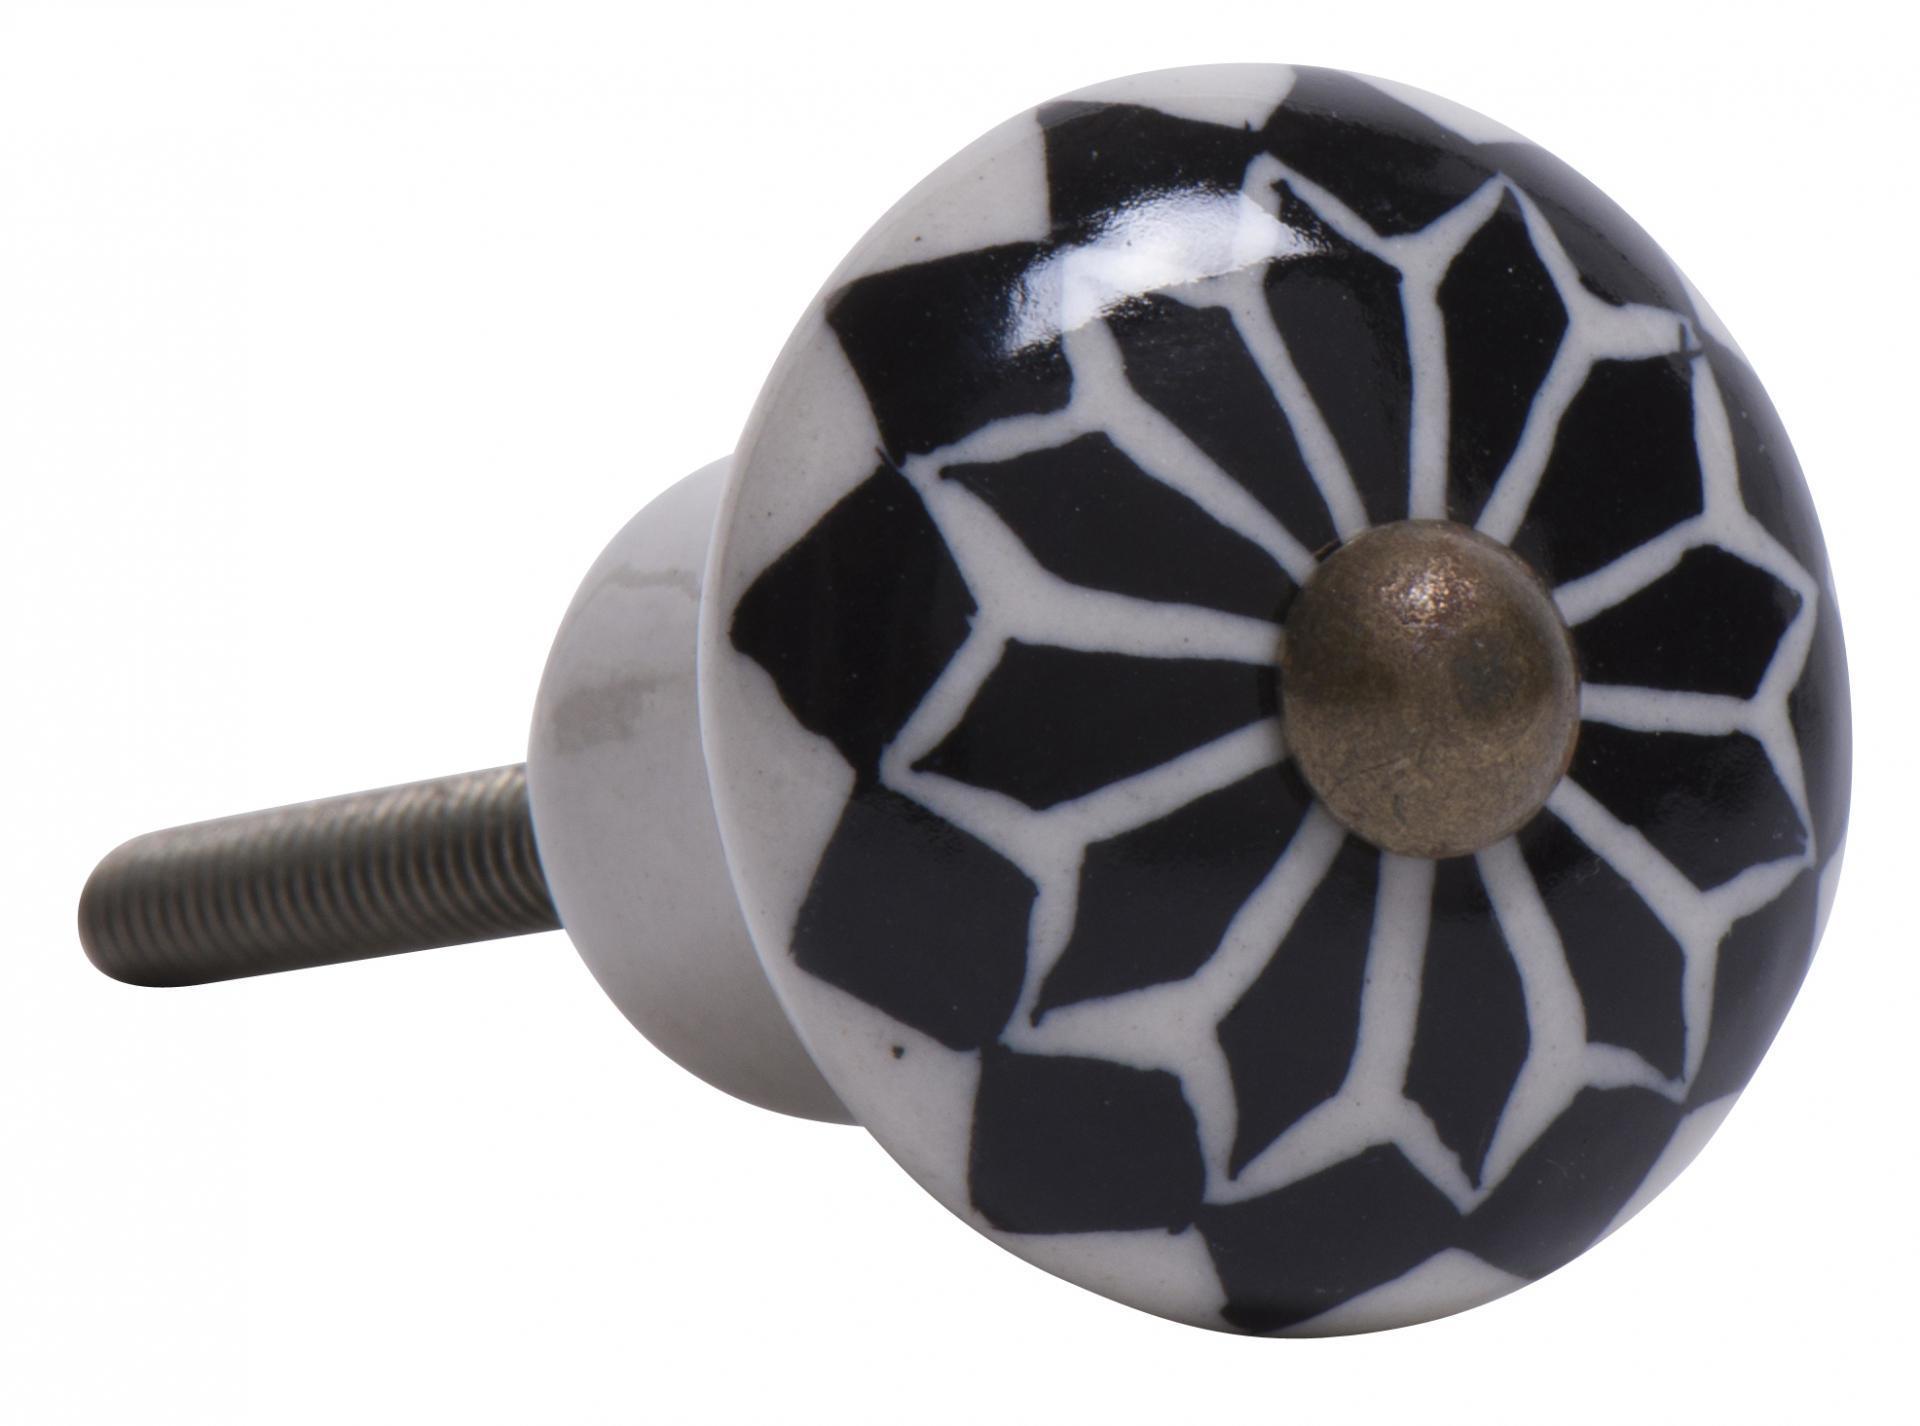 IB LAURSEN Porcelánová úchytka Diamond, černá barva, porcelán